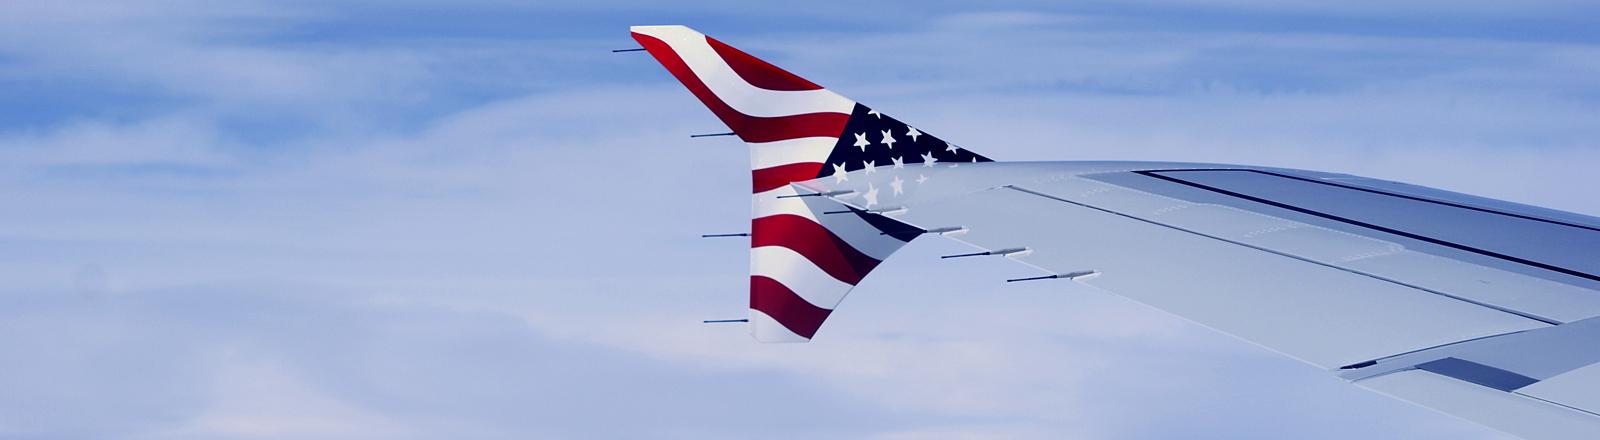 Flugzeug mit USA-Flagge